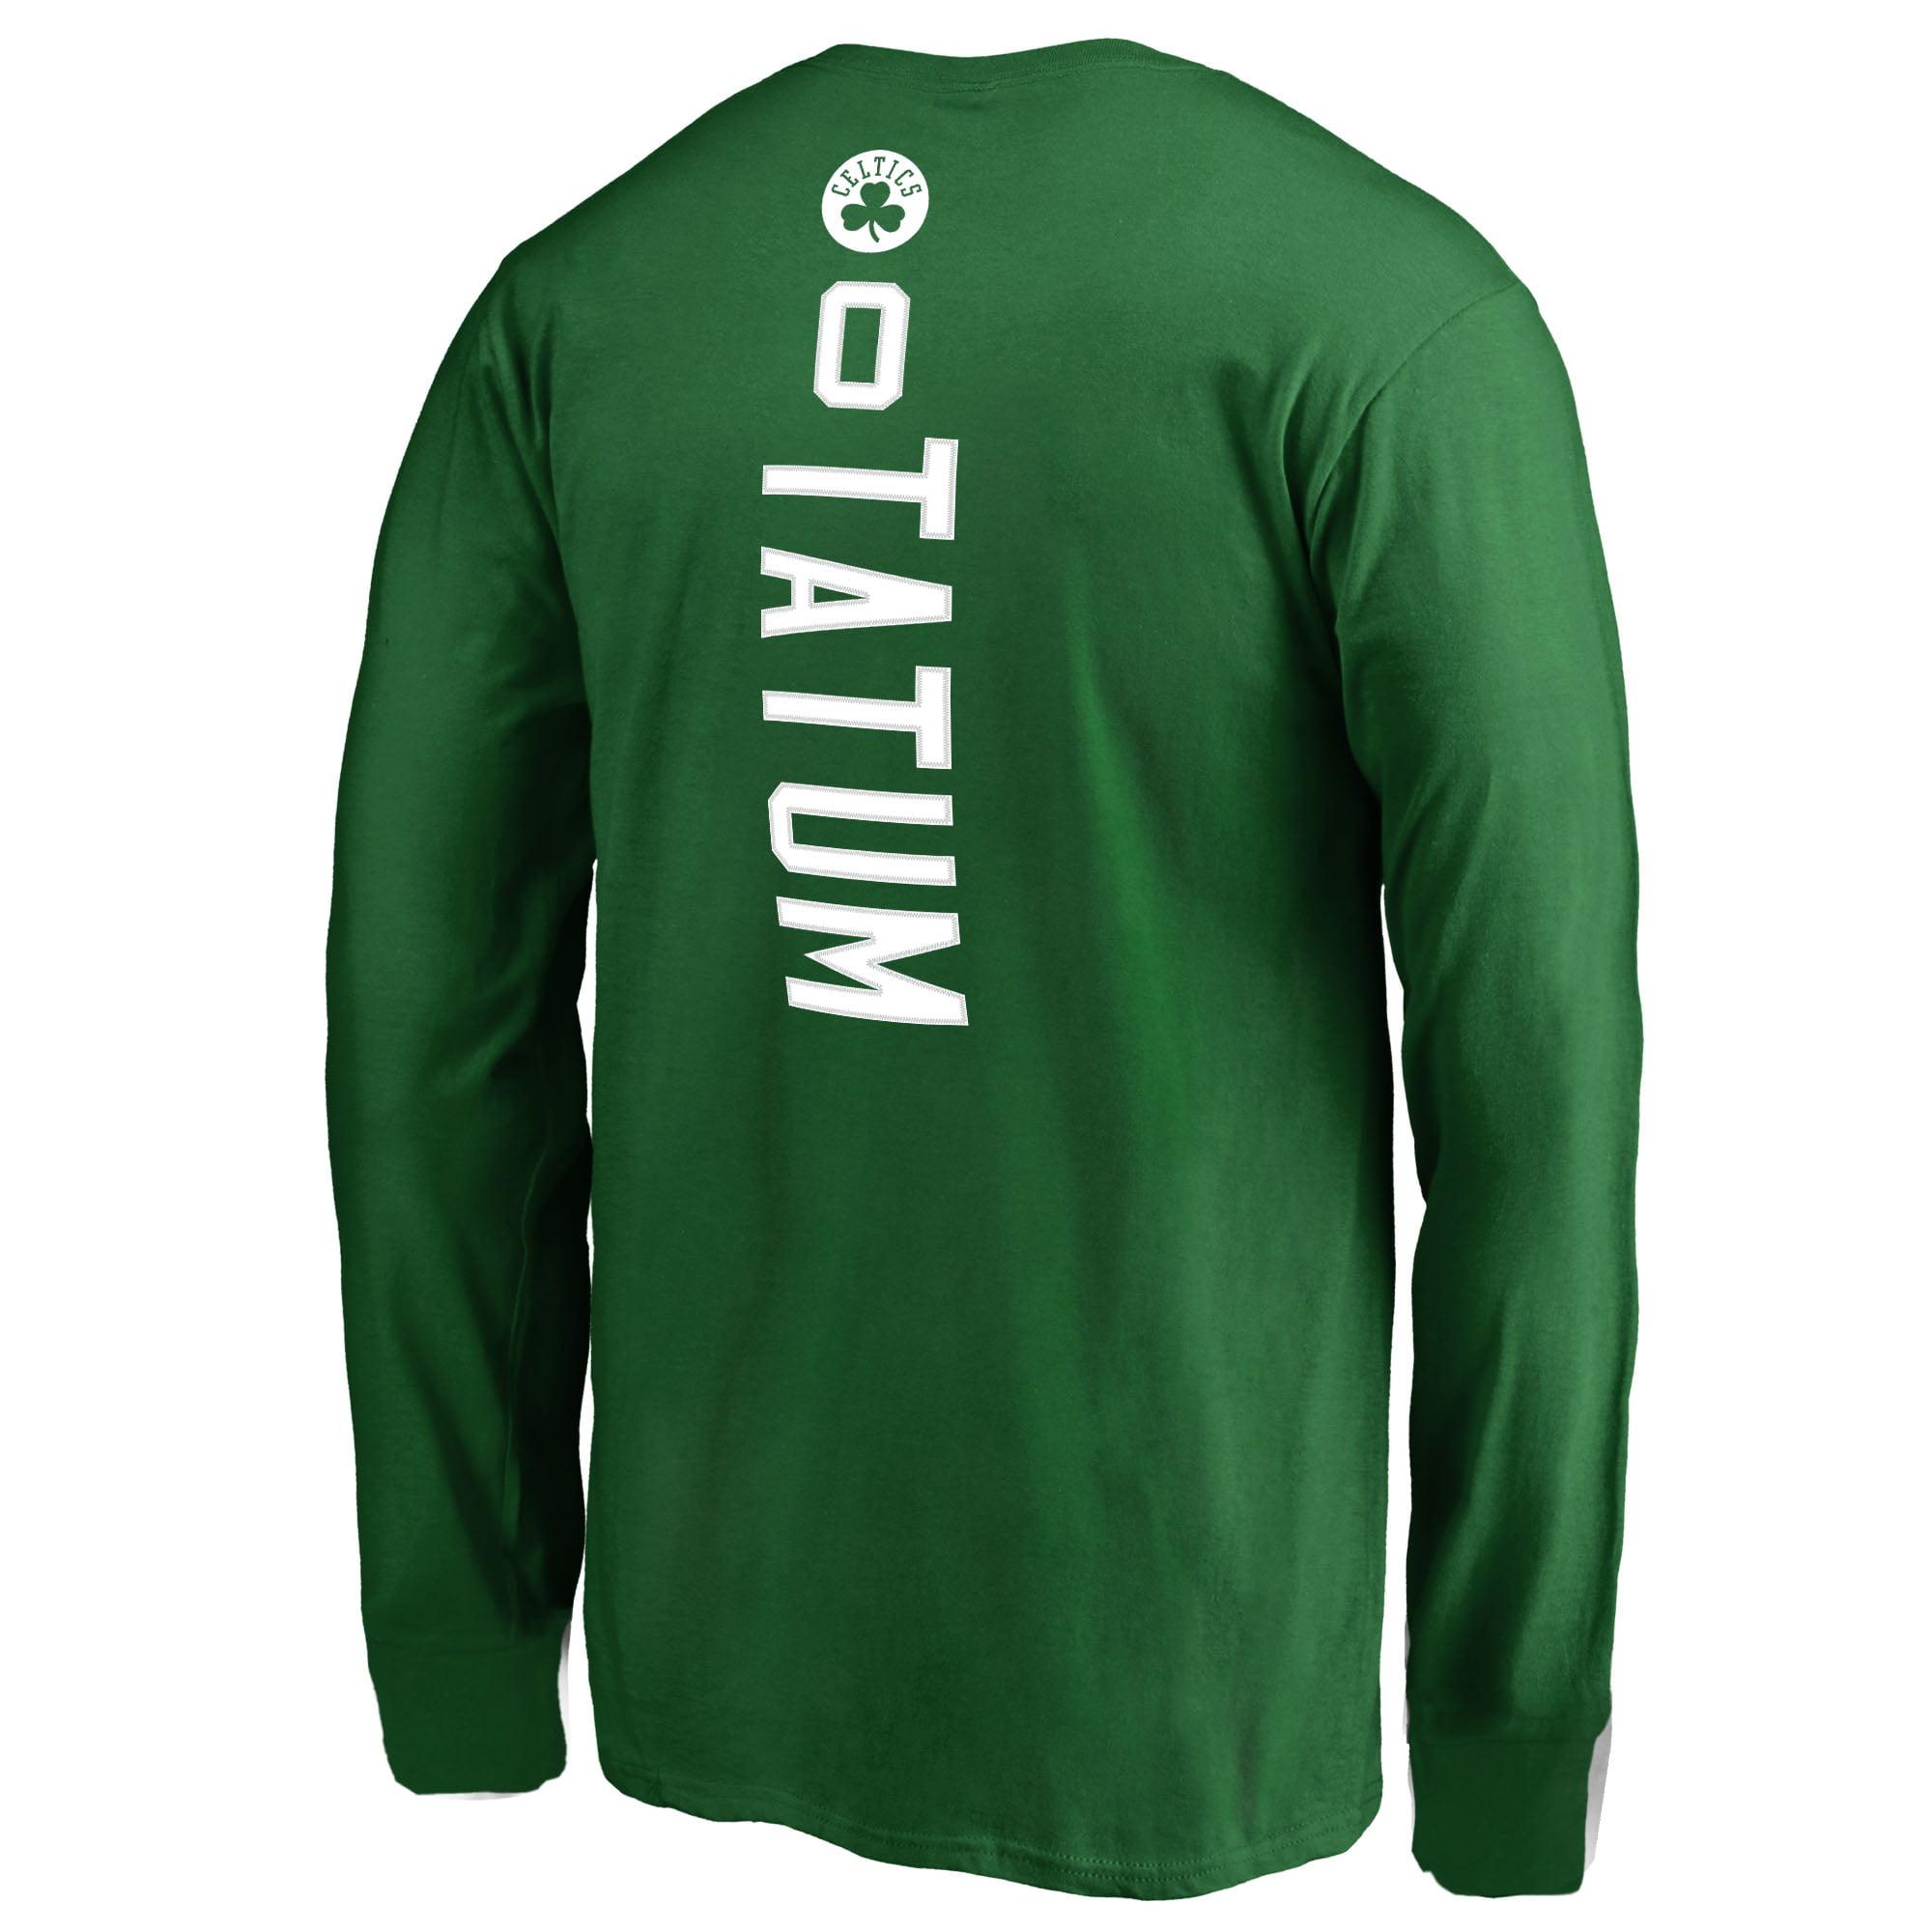 2db594ae529 Jayson Tatum Boston Celtics Fanatics Branded Youth Team Backer Name & Number  Long Sleeve T-Shirt - Kelly Green - Walmart.com